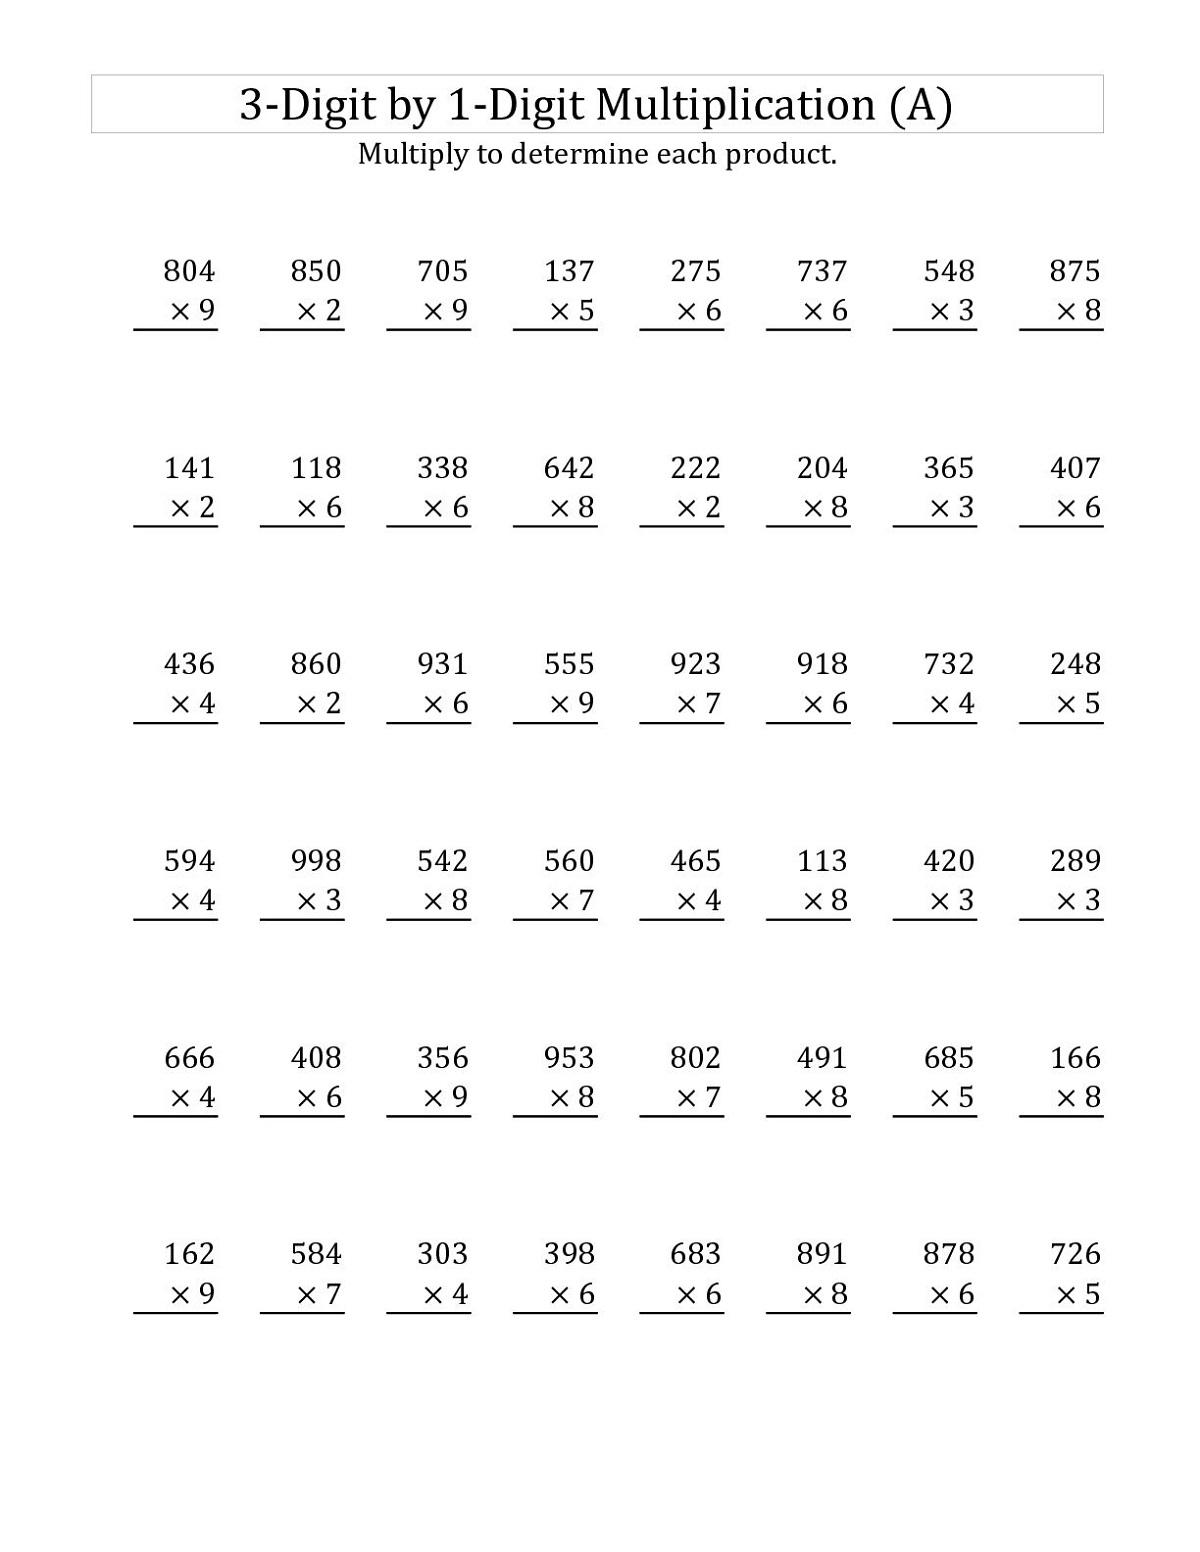 Worksheet For Class 3 On Multiplication | Printable inside Printable Multiplication By 3